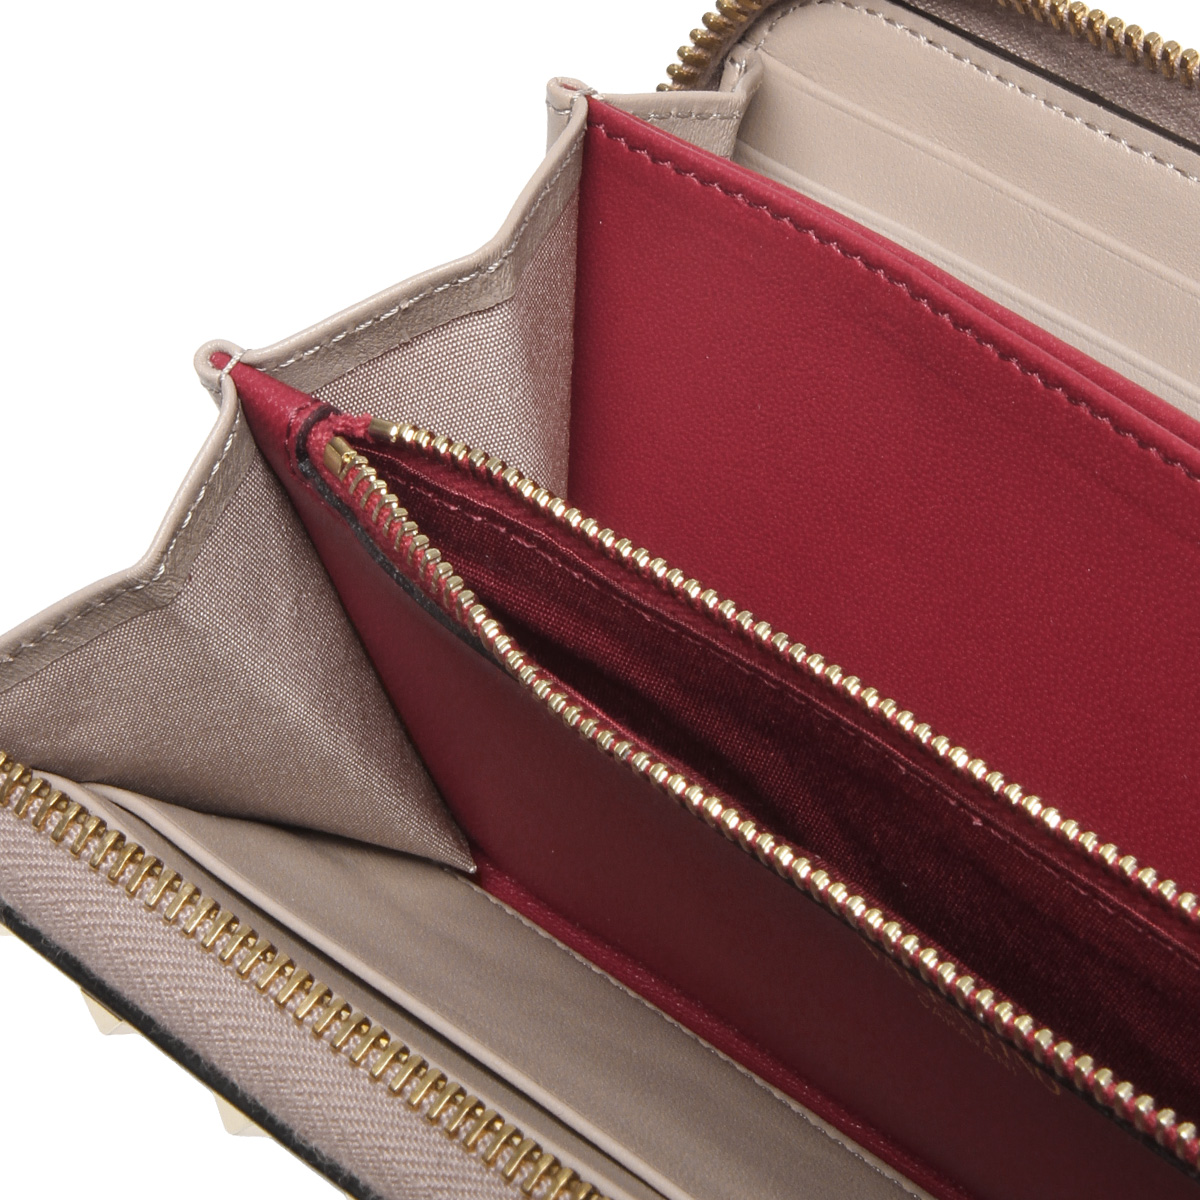 91847dd0e3fb7 ... Valentino VALENTINO wallet Lady's PW2P0P00NAP P45 round fastener long  wallet ROCKSTUD SPIKE lock stud bolt spikes ...